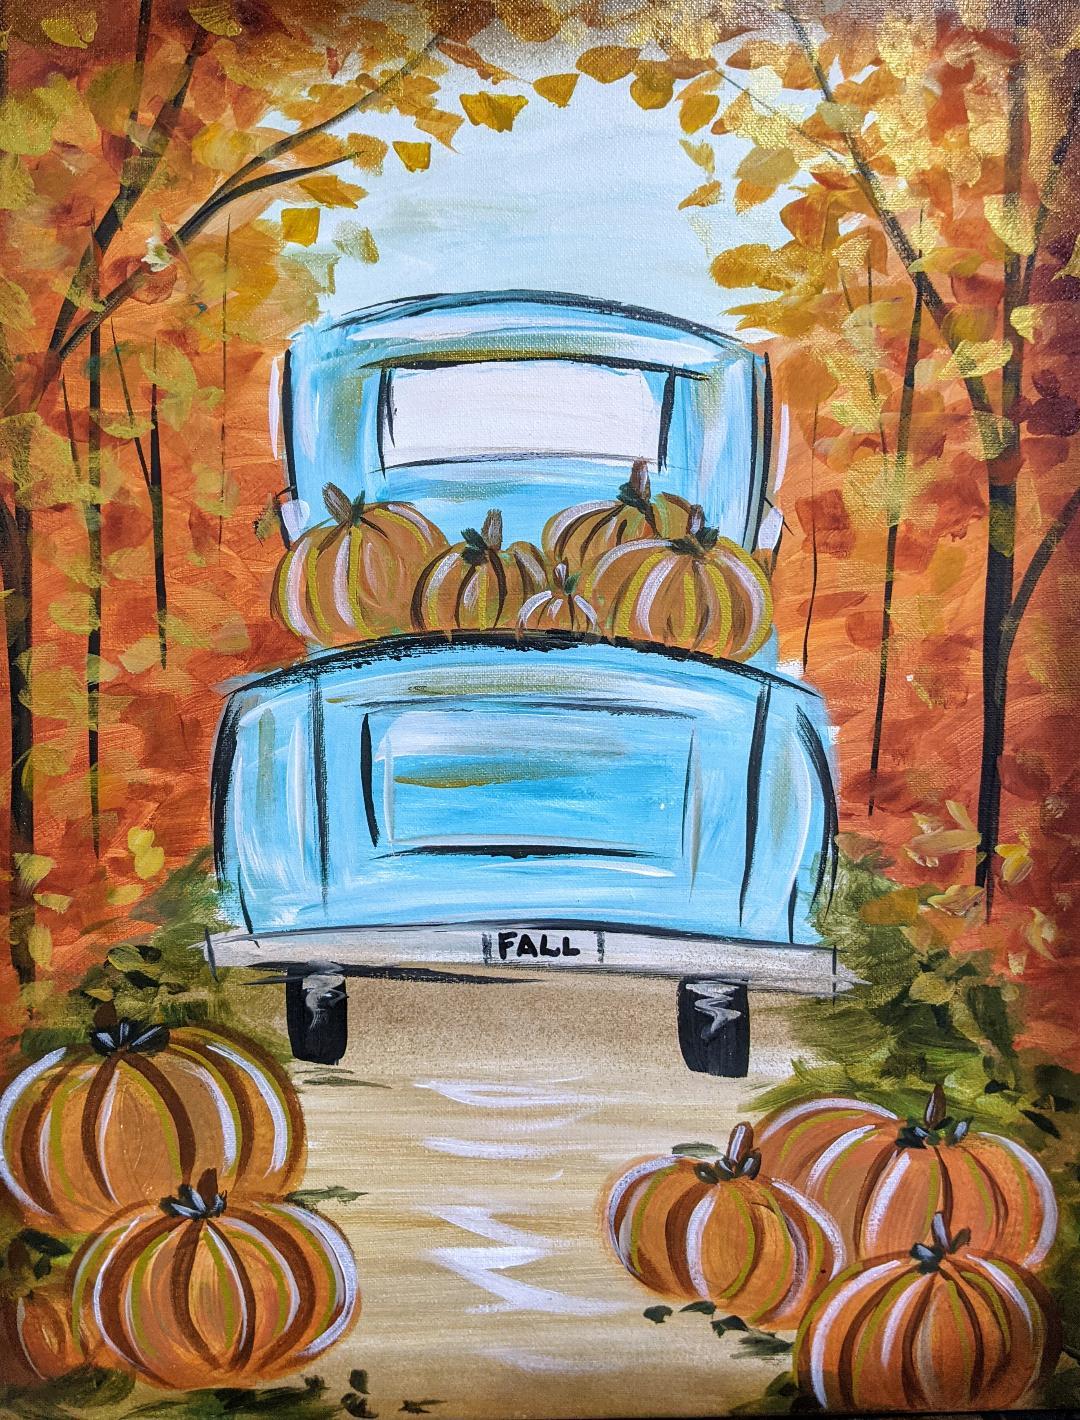 Fall Teal Truck